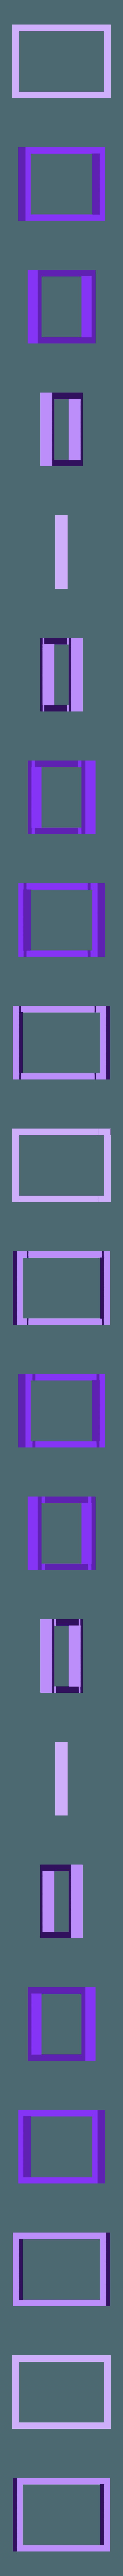 joistic.STL Download free STL file mobile step • 3D printable design, izanferrco